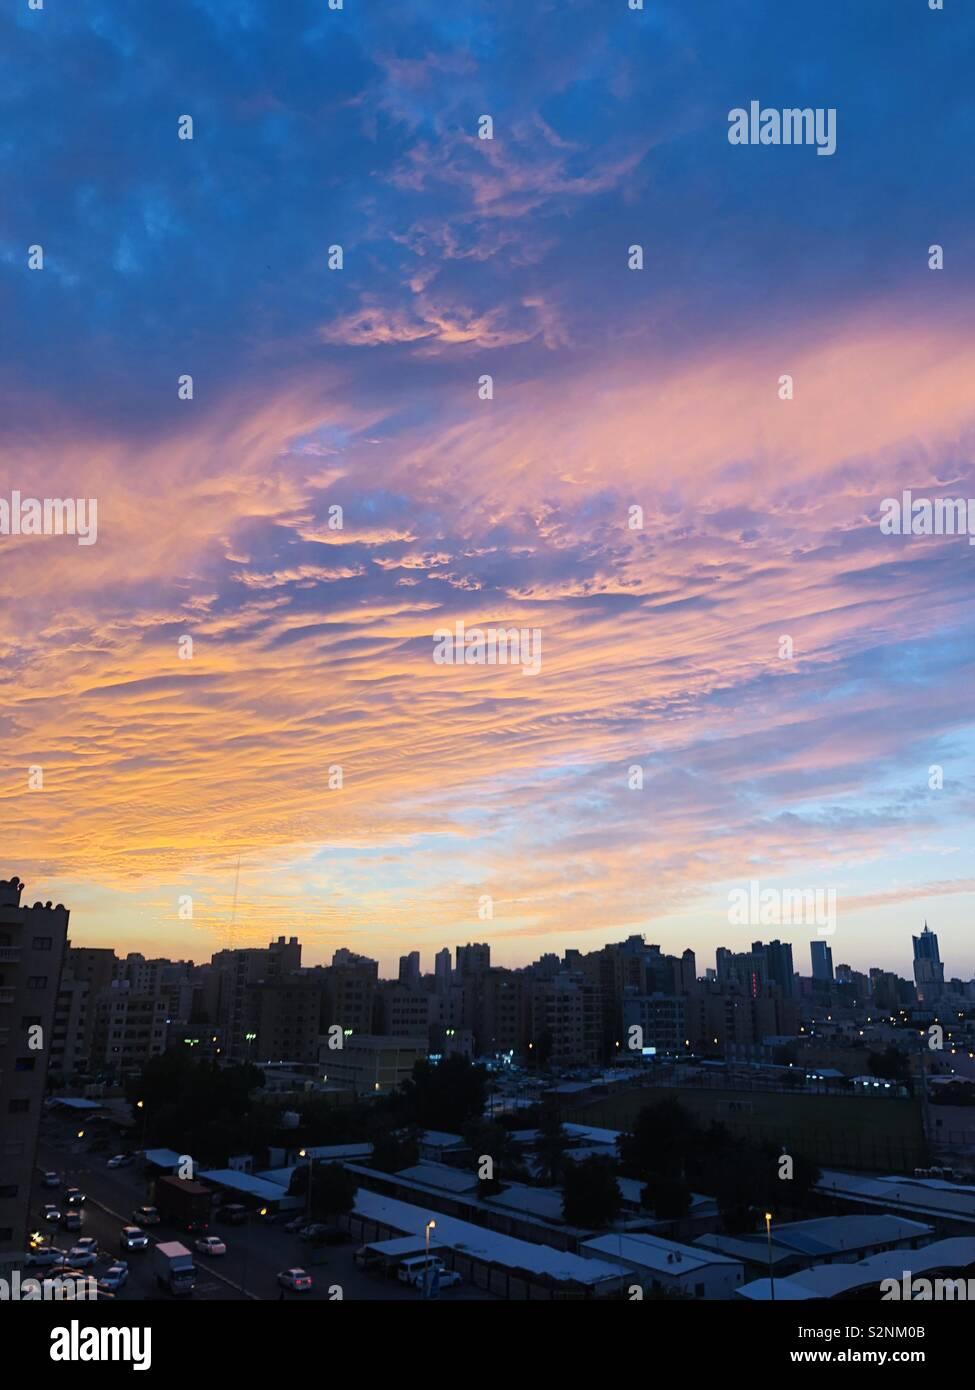 Sunset in Kuwait - Stock Image